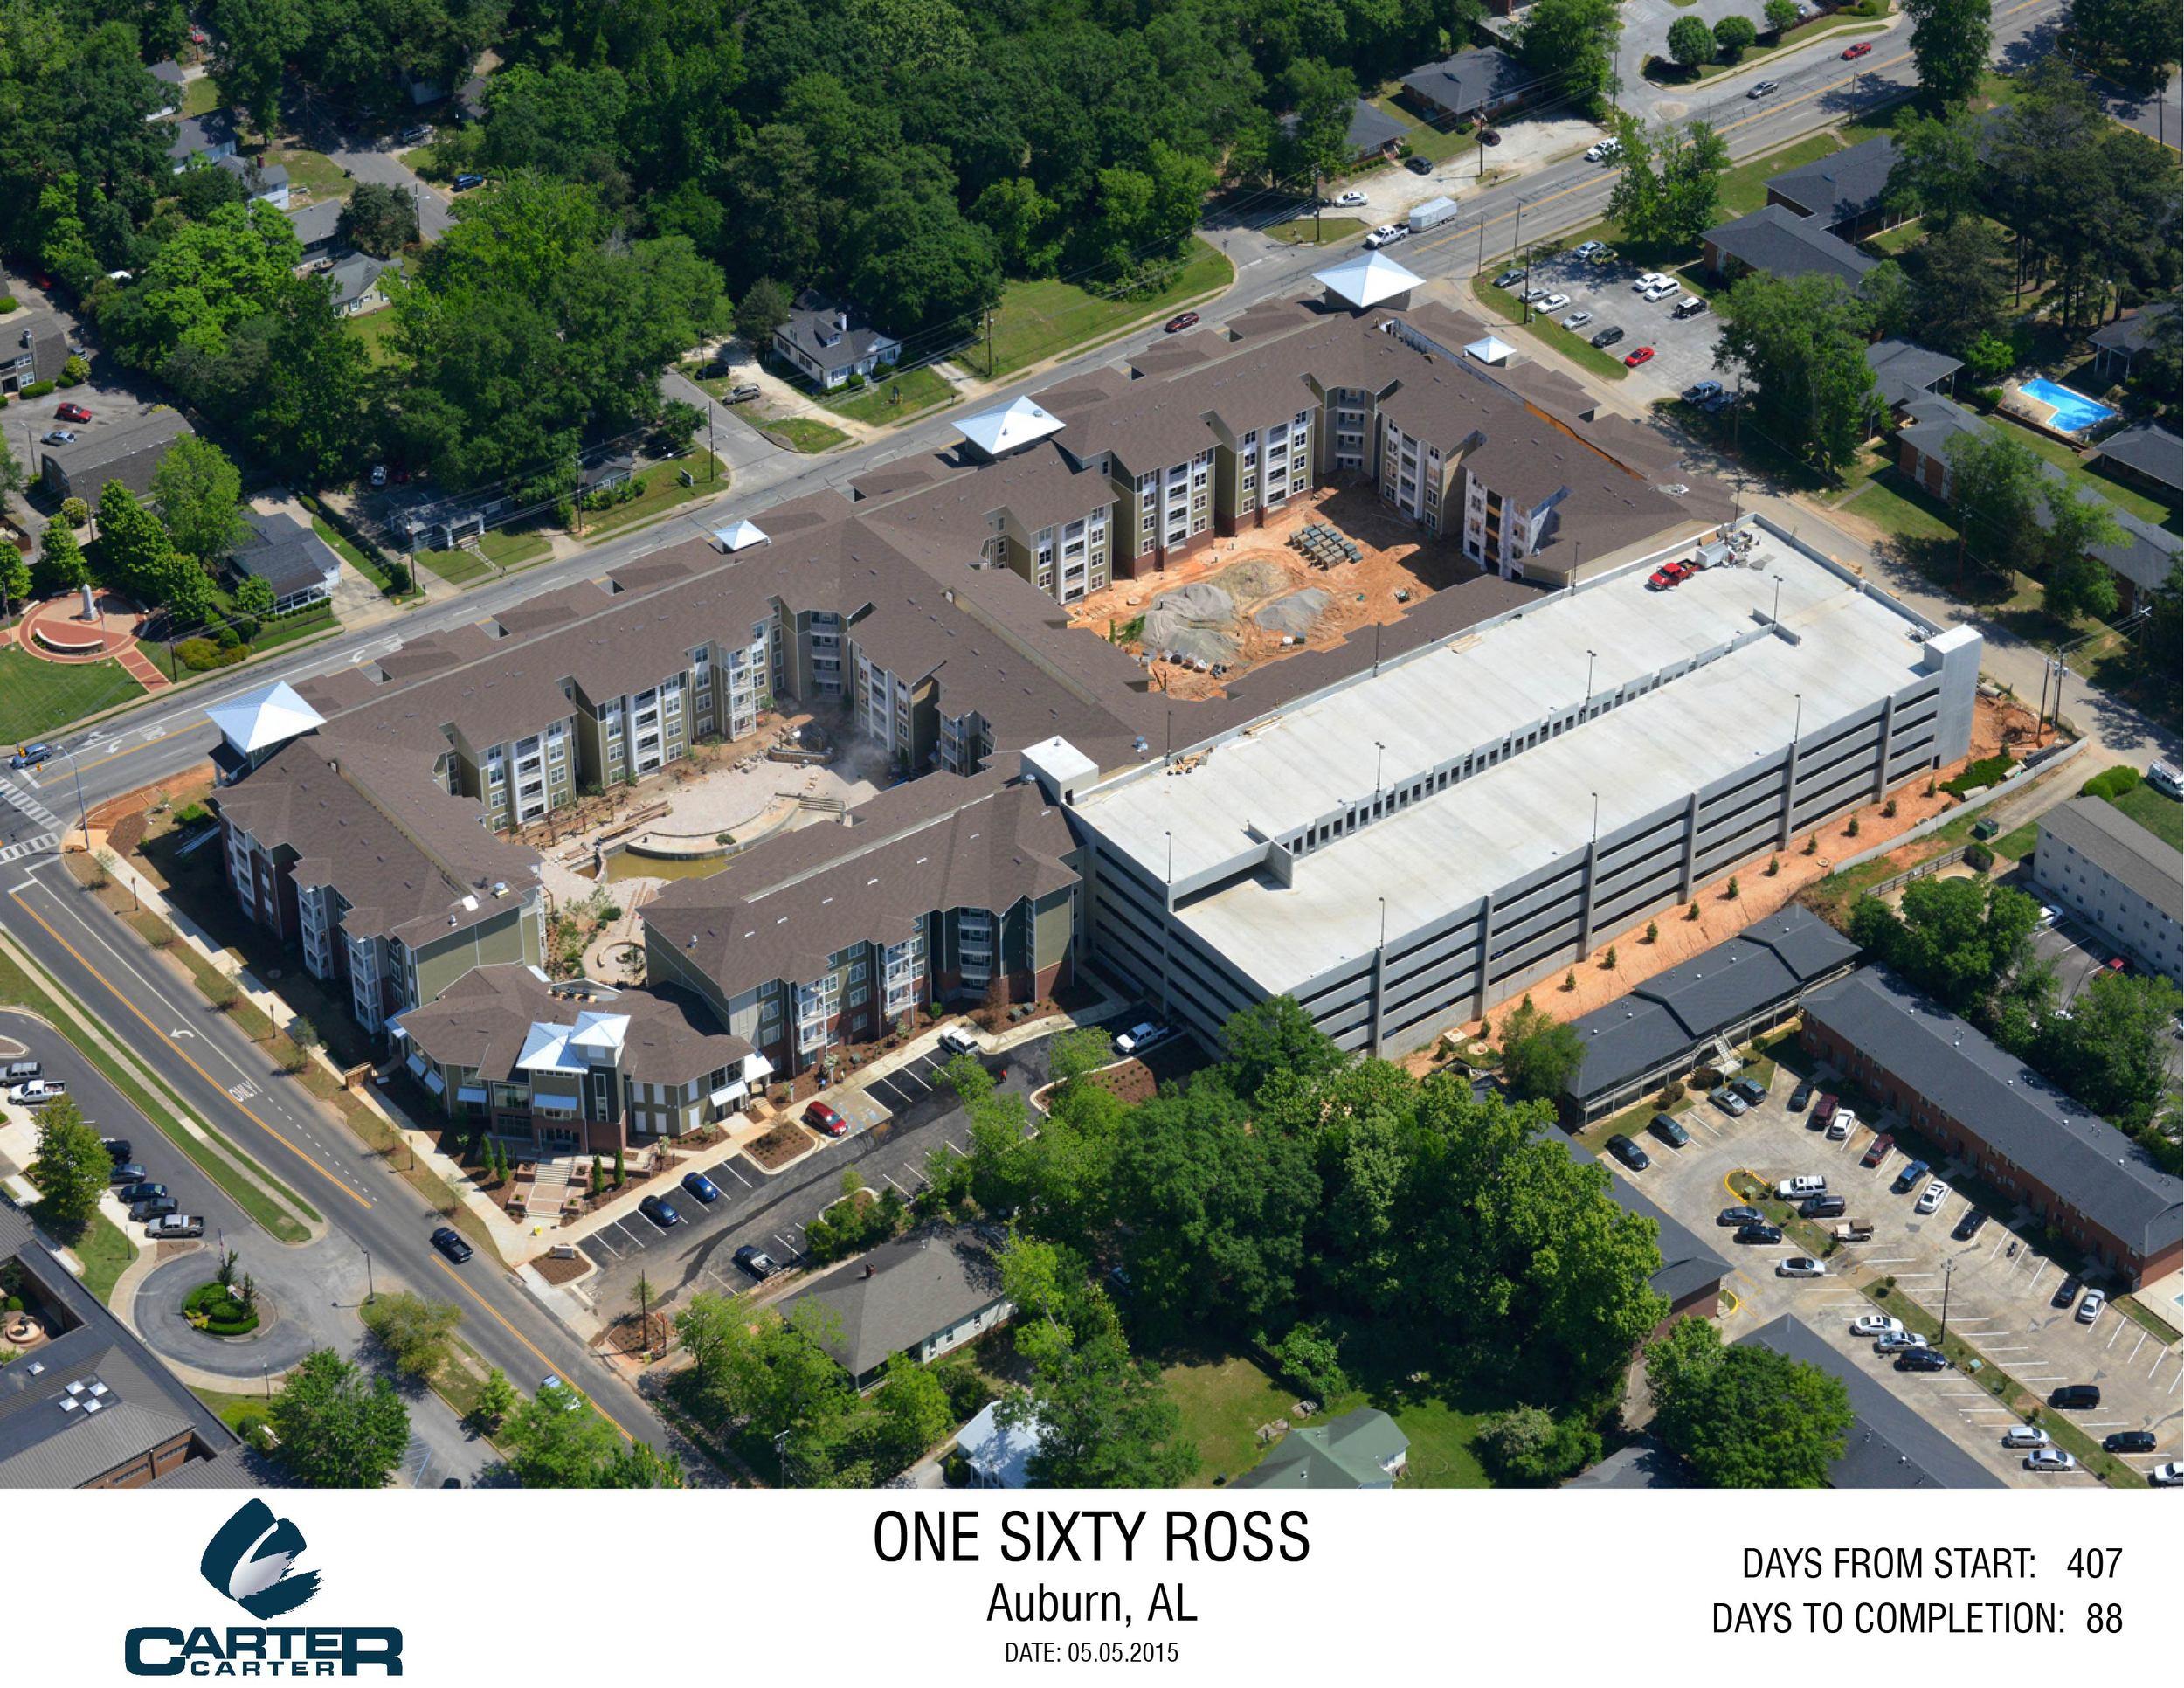 One Sixty Ross 1505052024-CC.jpg